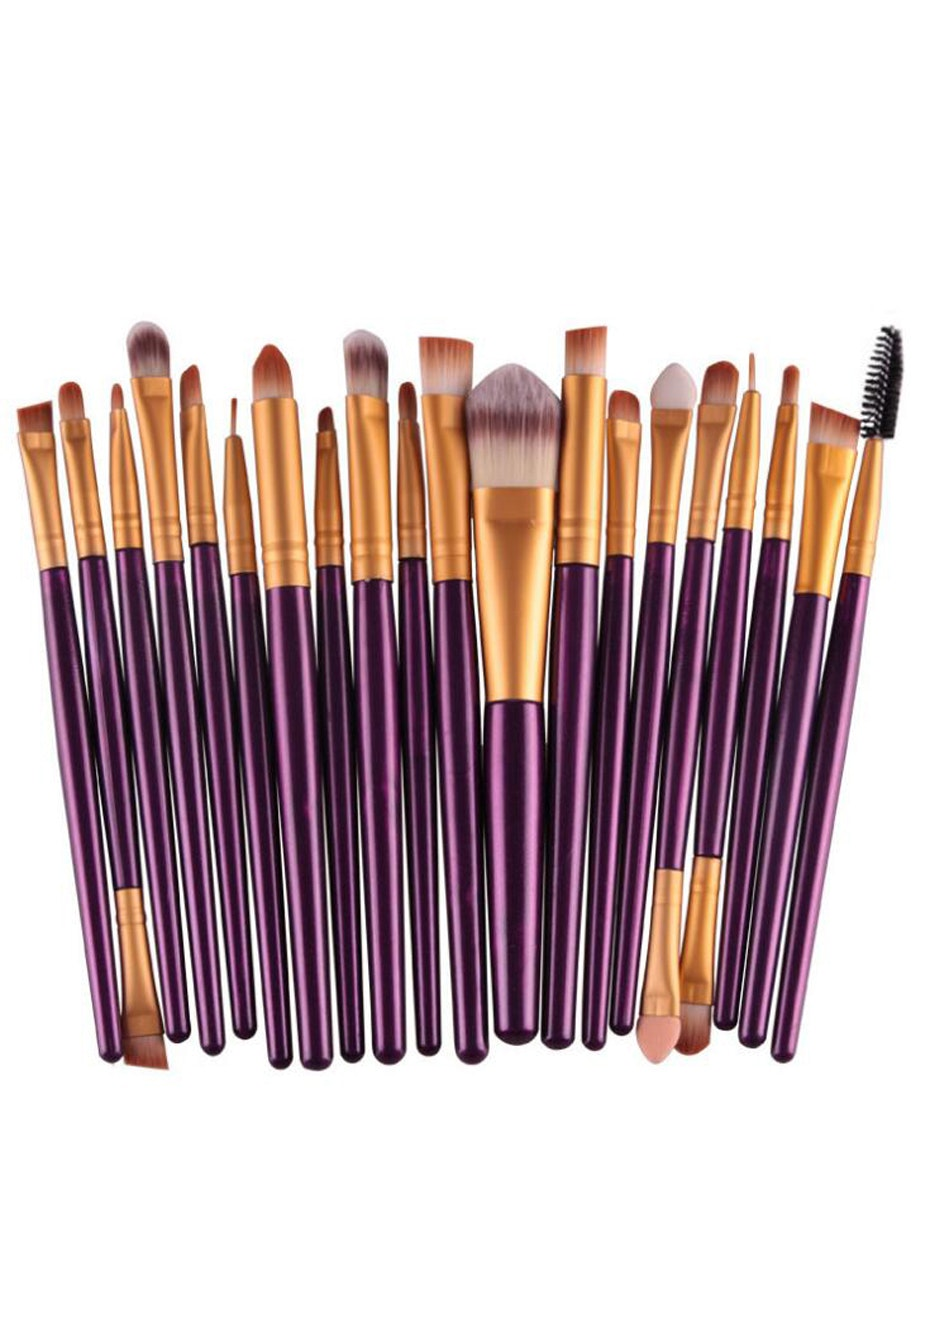 20pc Make up kit brush set